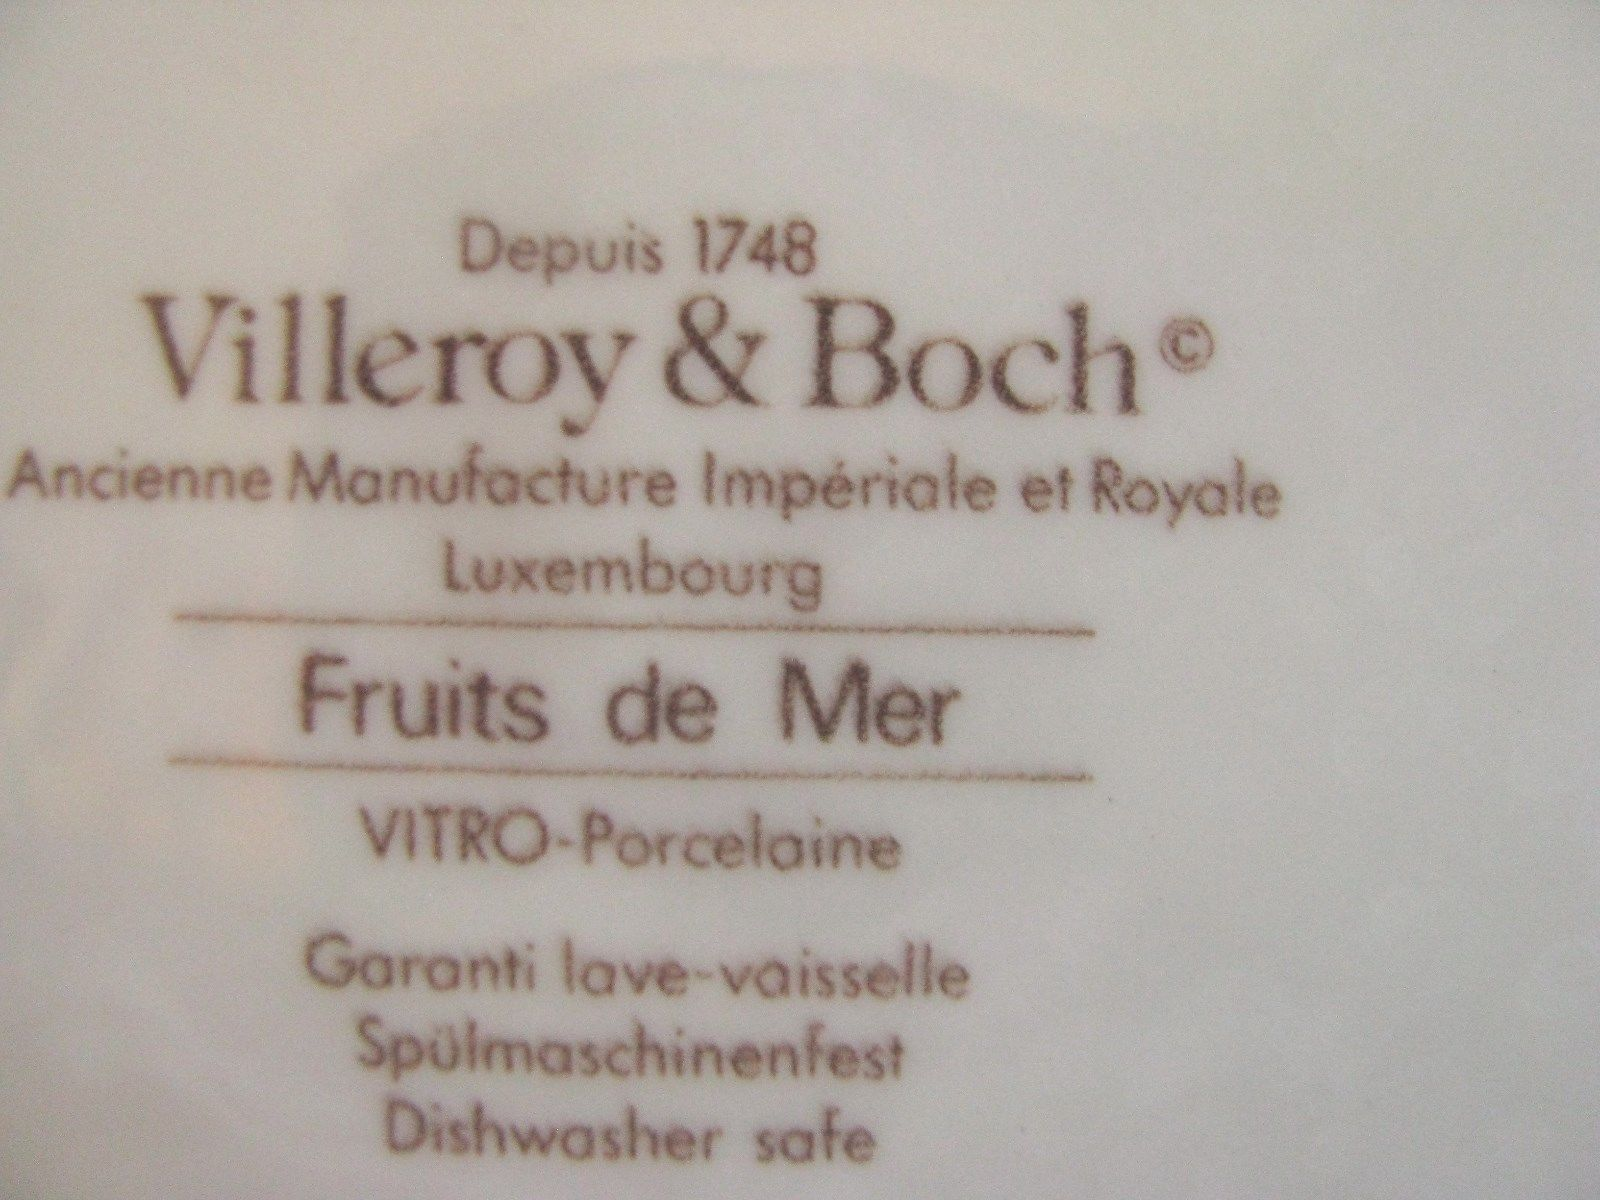 "2 VILLEROY & BOCH   Service Plate Charger  12""  FRUITS DE MER  retired"